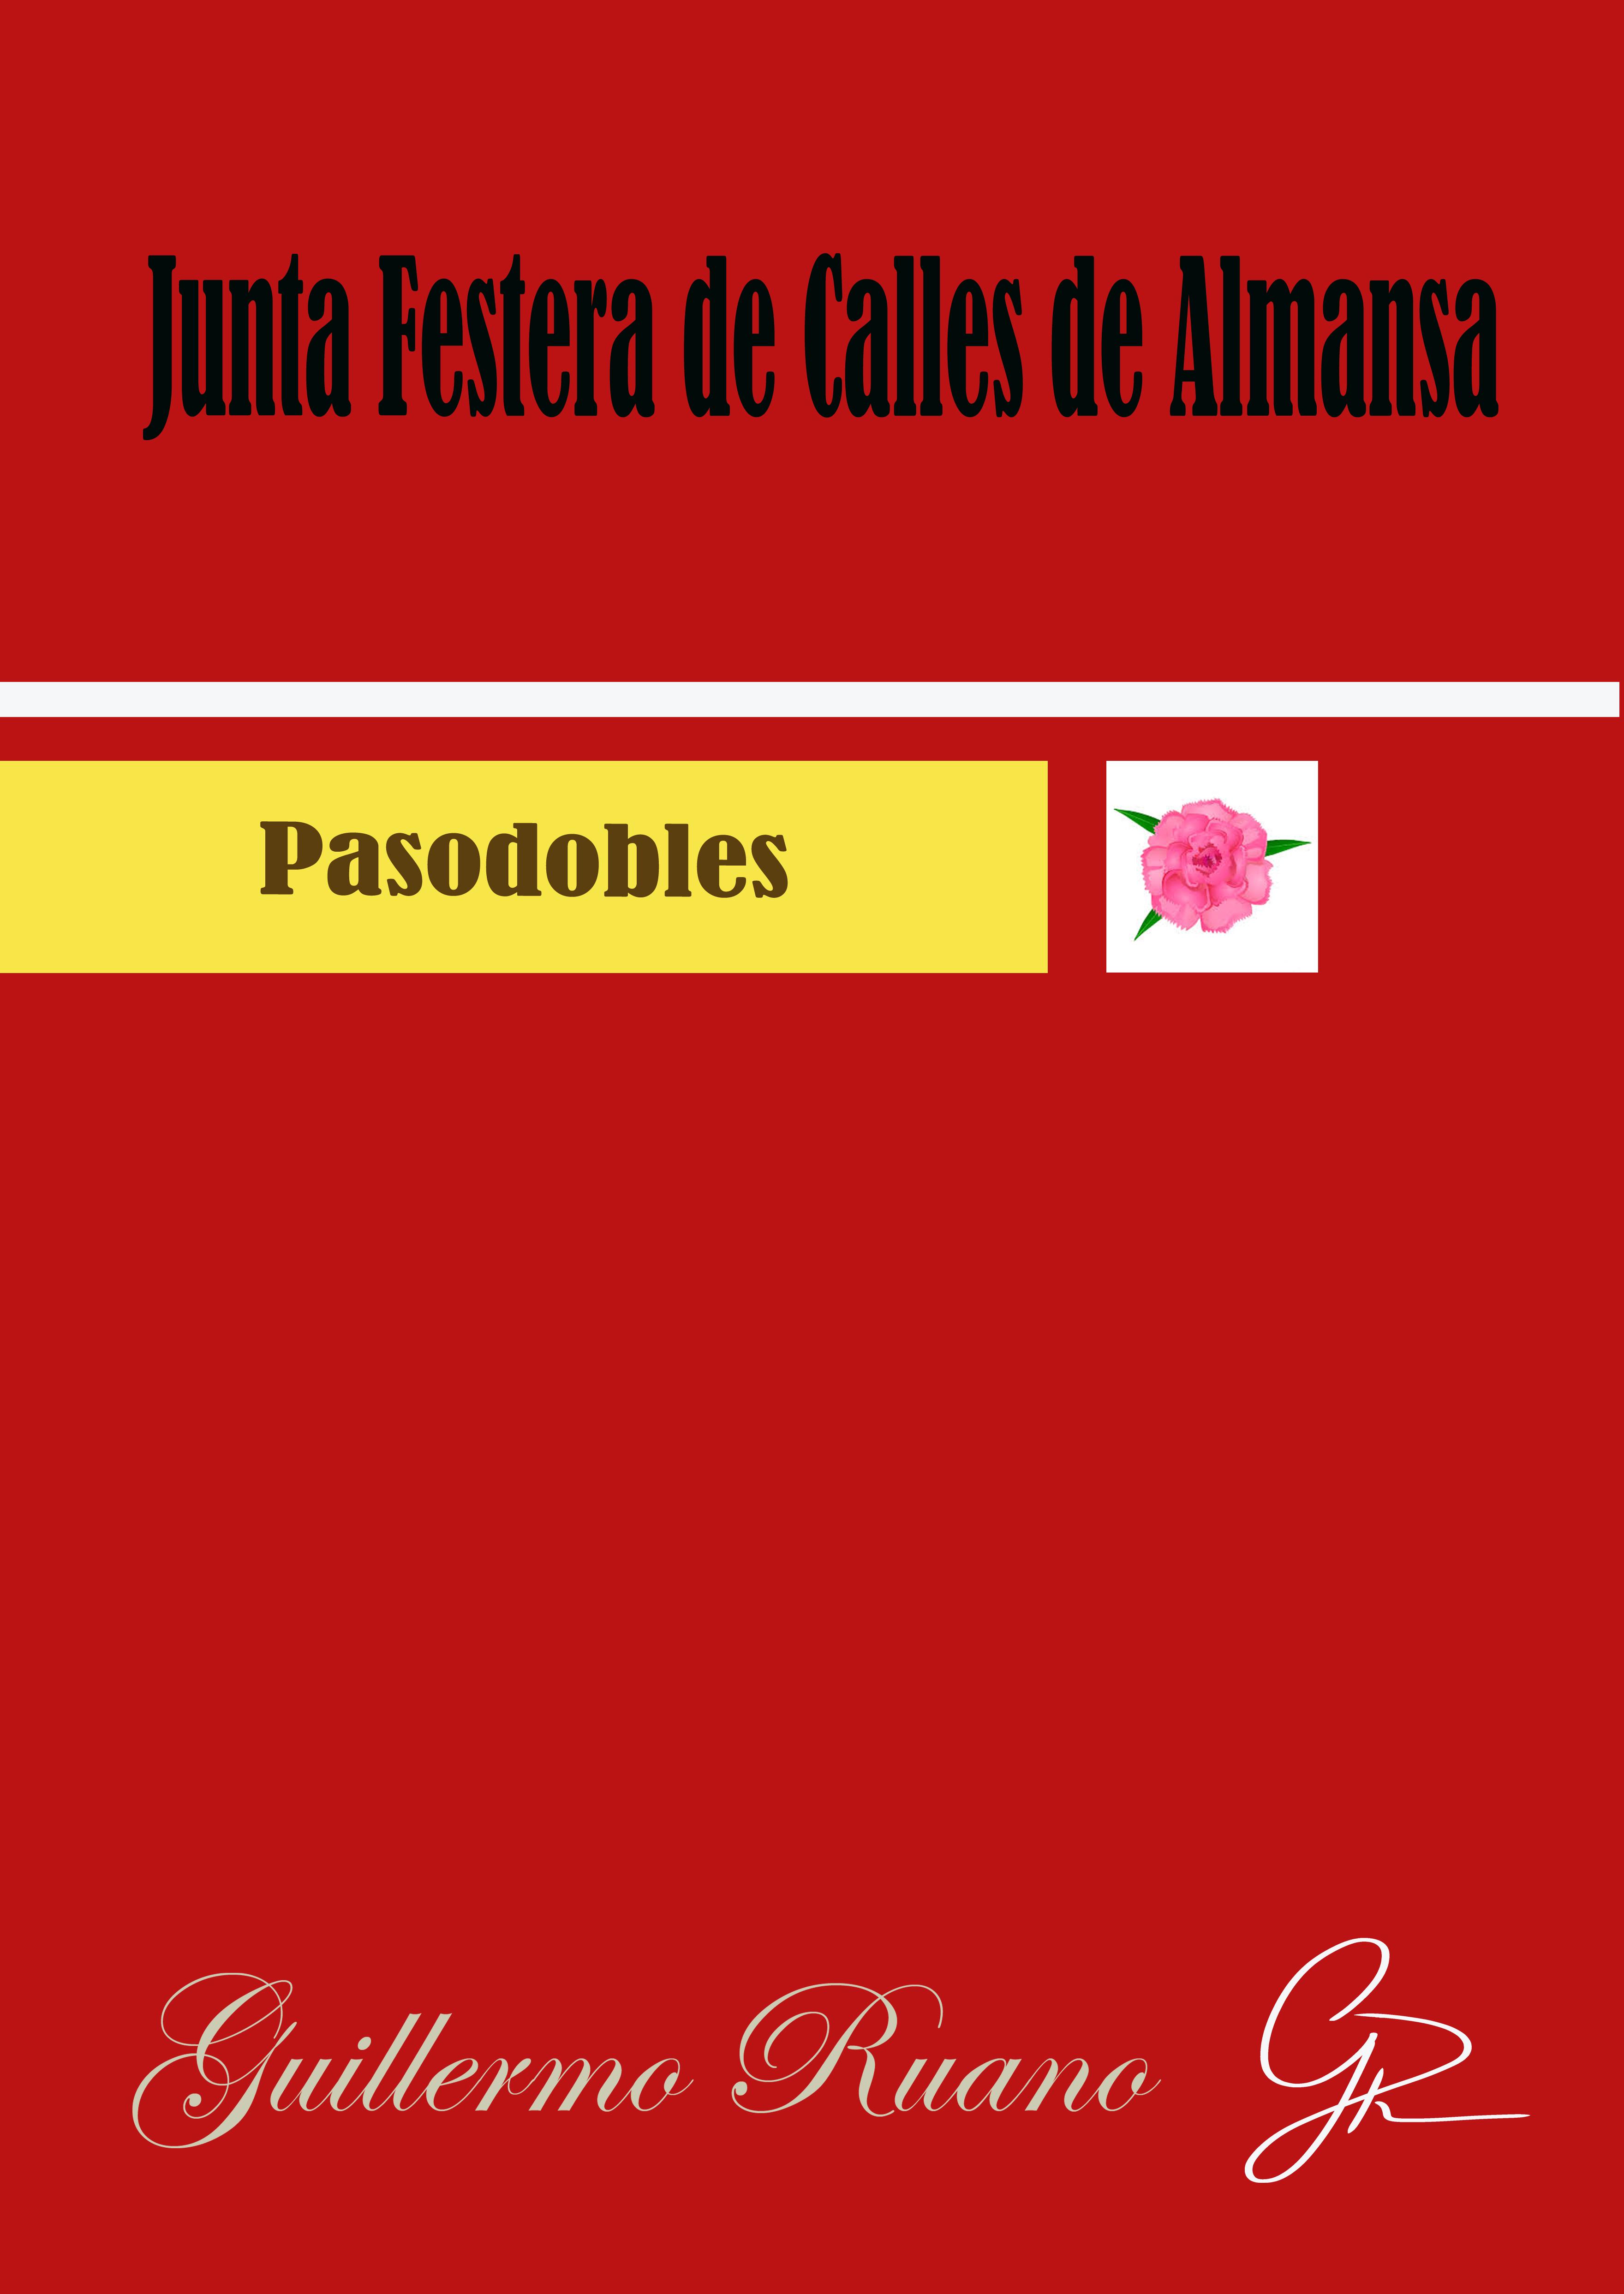 Junta Festera de Calles de Almansa